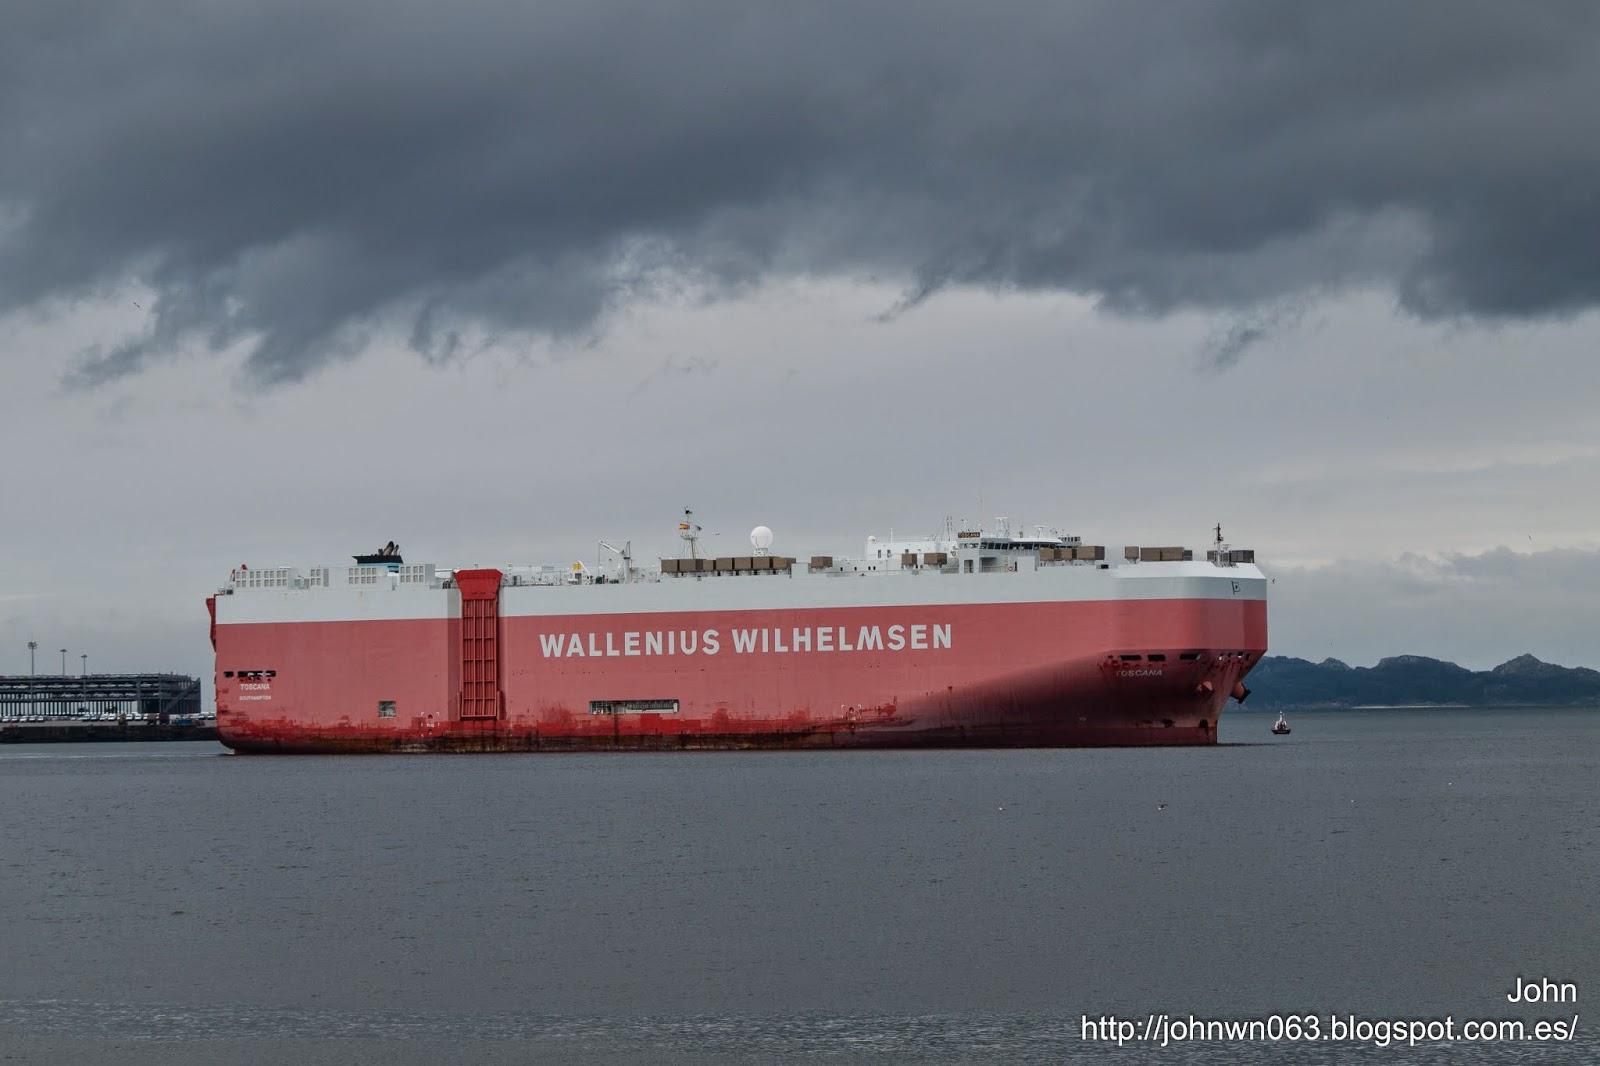 Toscana, vehicles carrier, ro-ro, bouzas, vigo, Wilhelmsen lines, fotos de barcos, imagenes de barcos, tecnologia